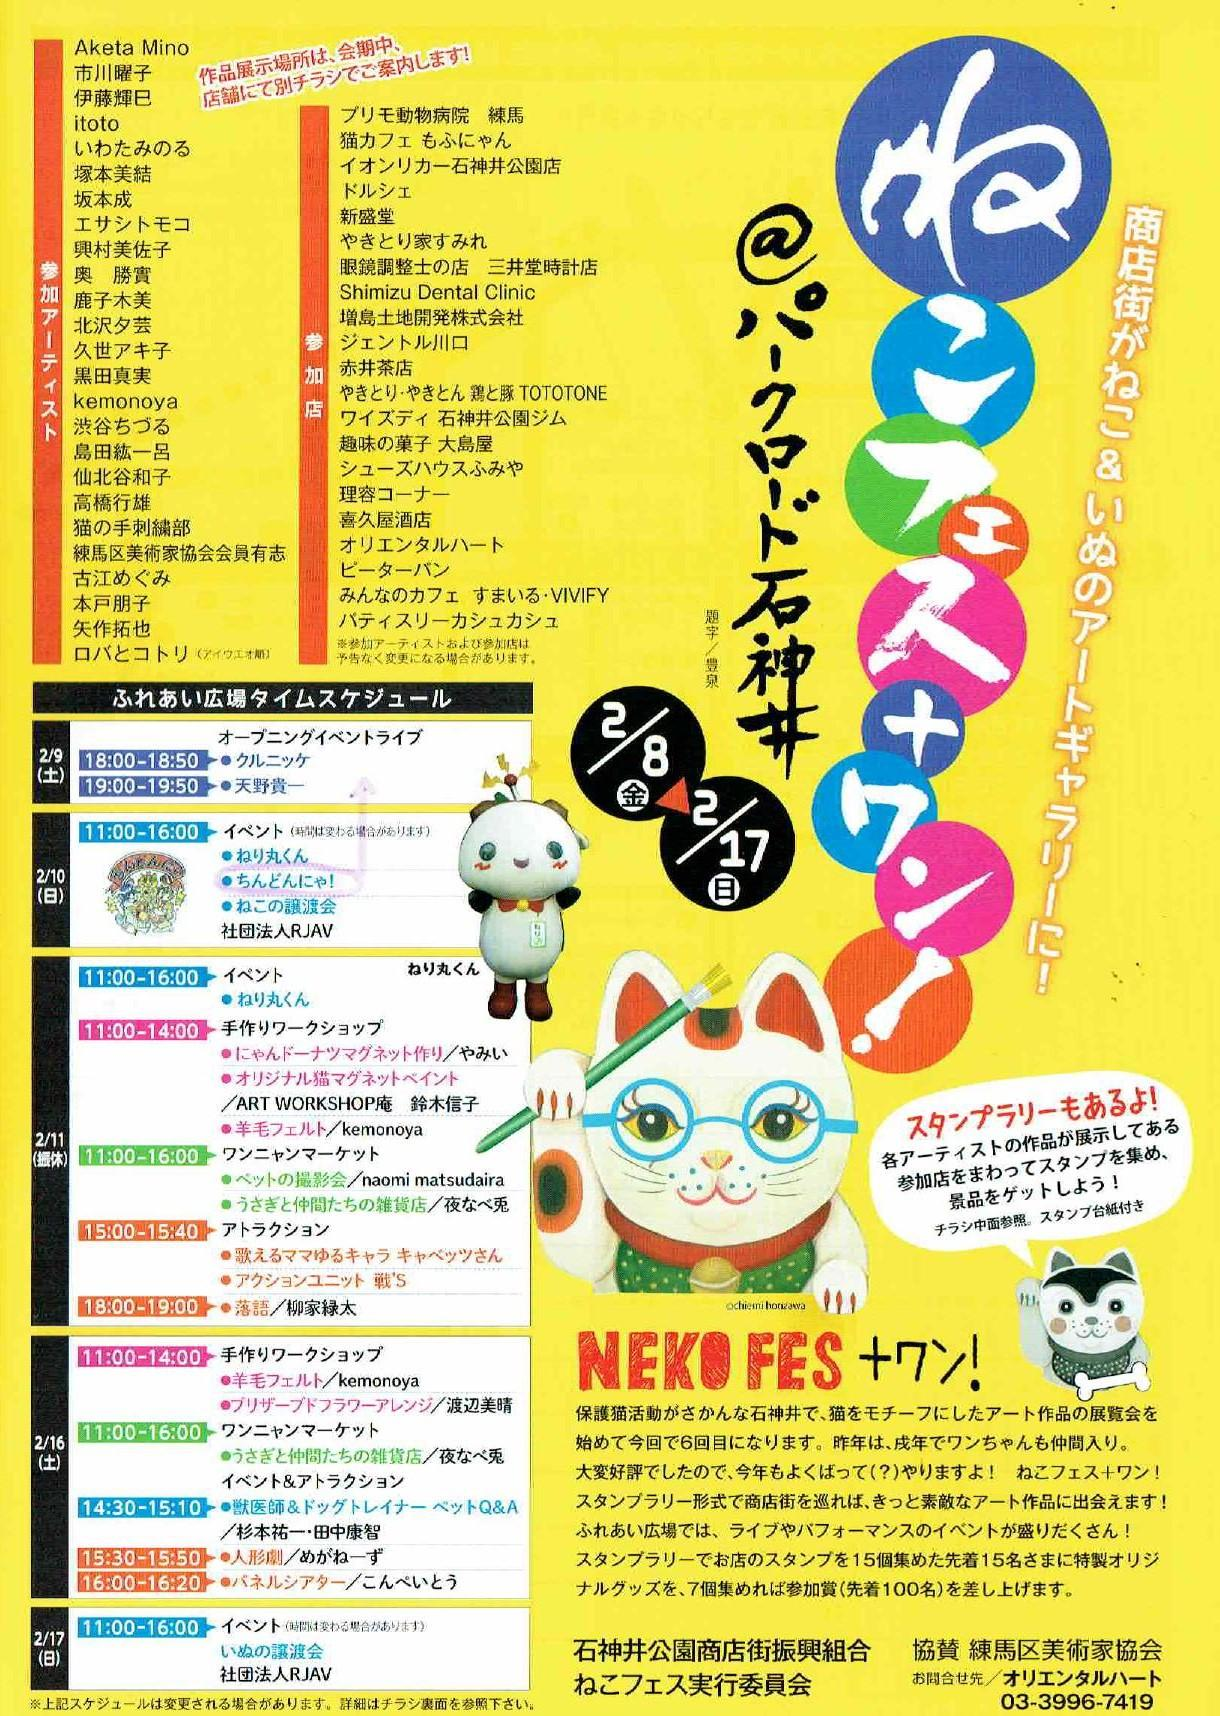 Cat festival + one! @ park road Shakujii